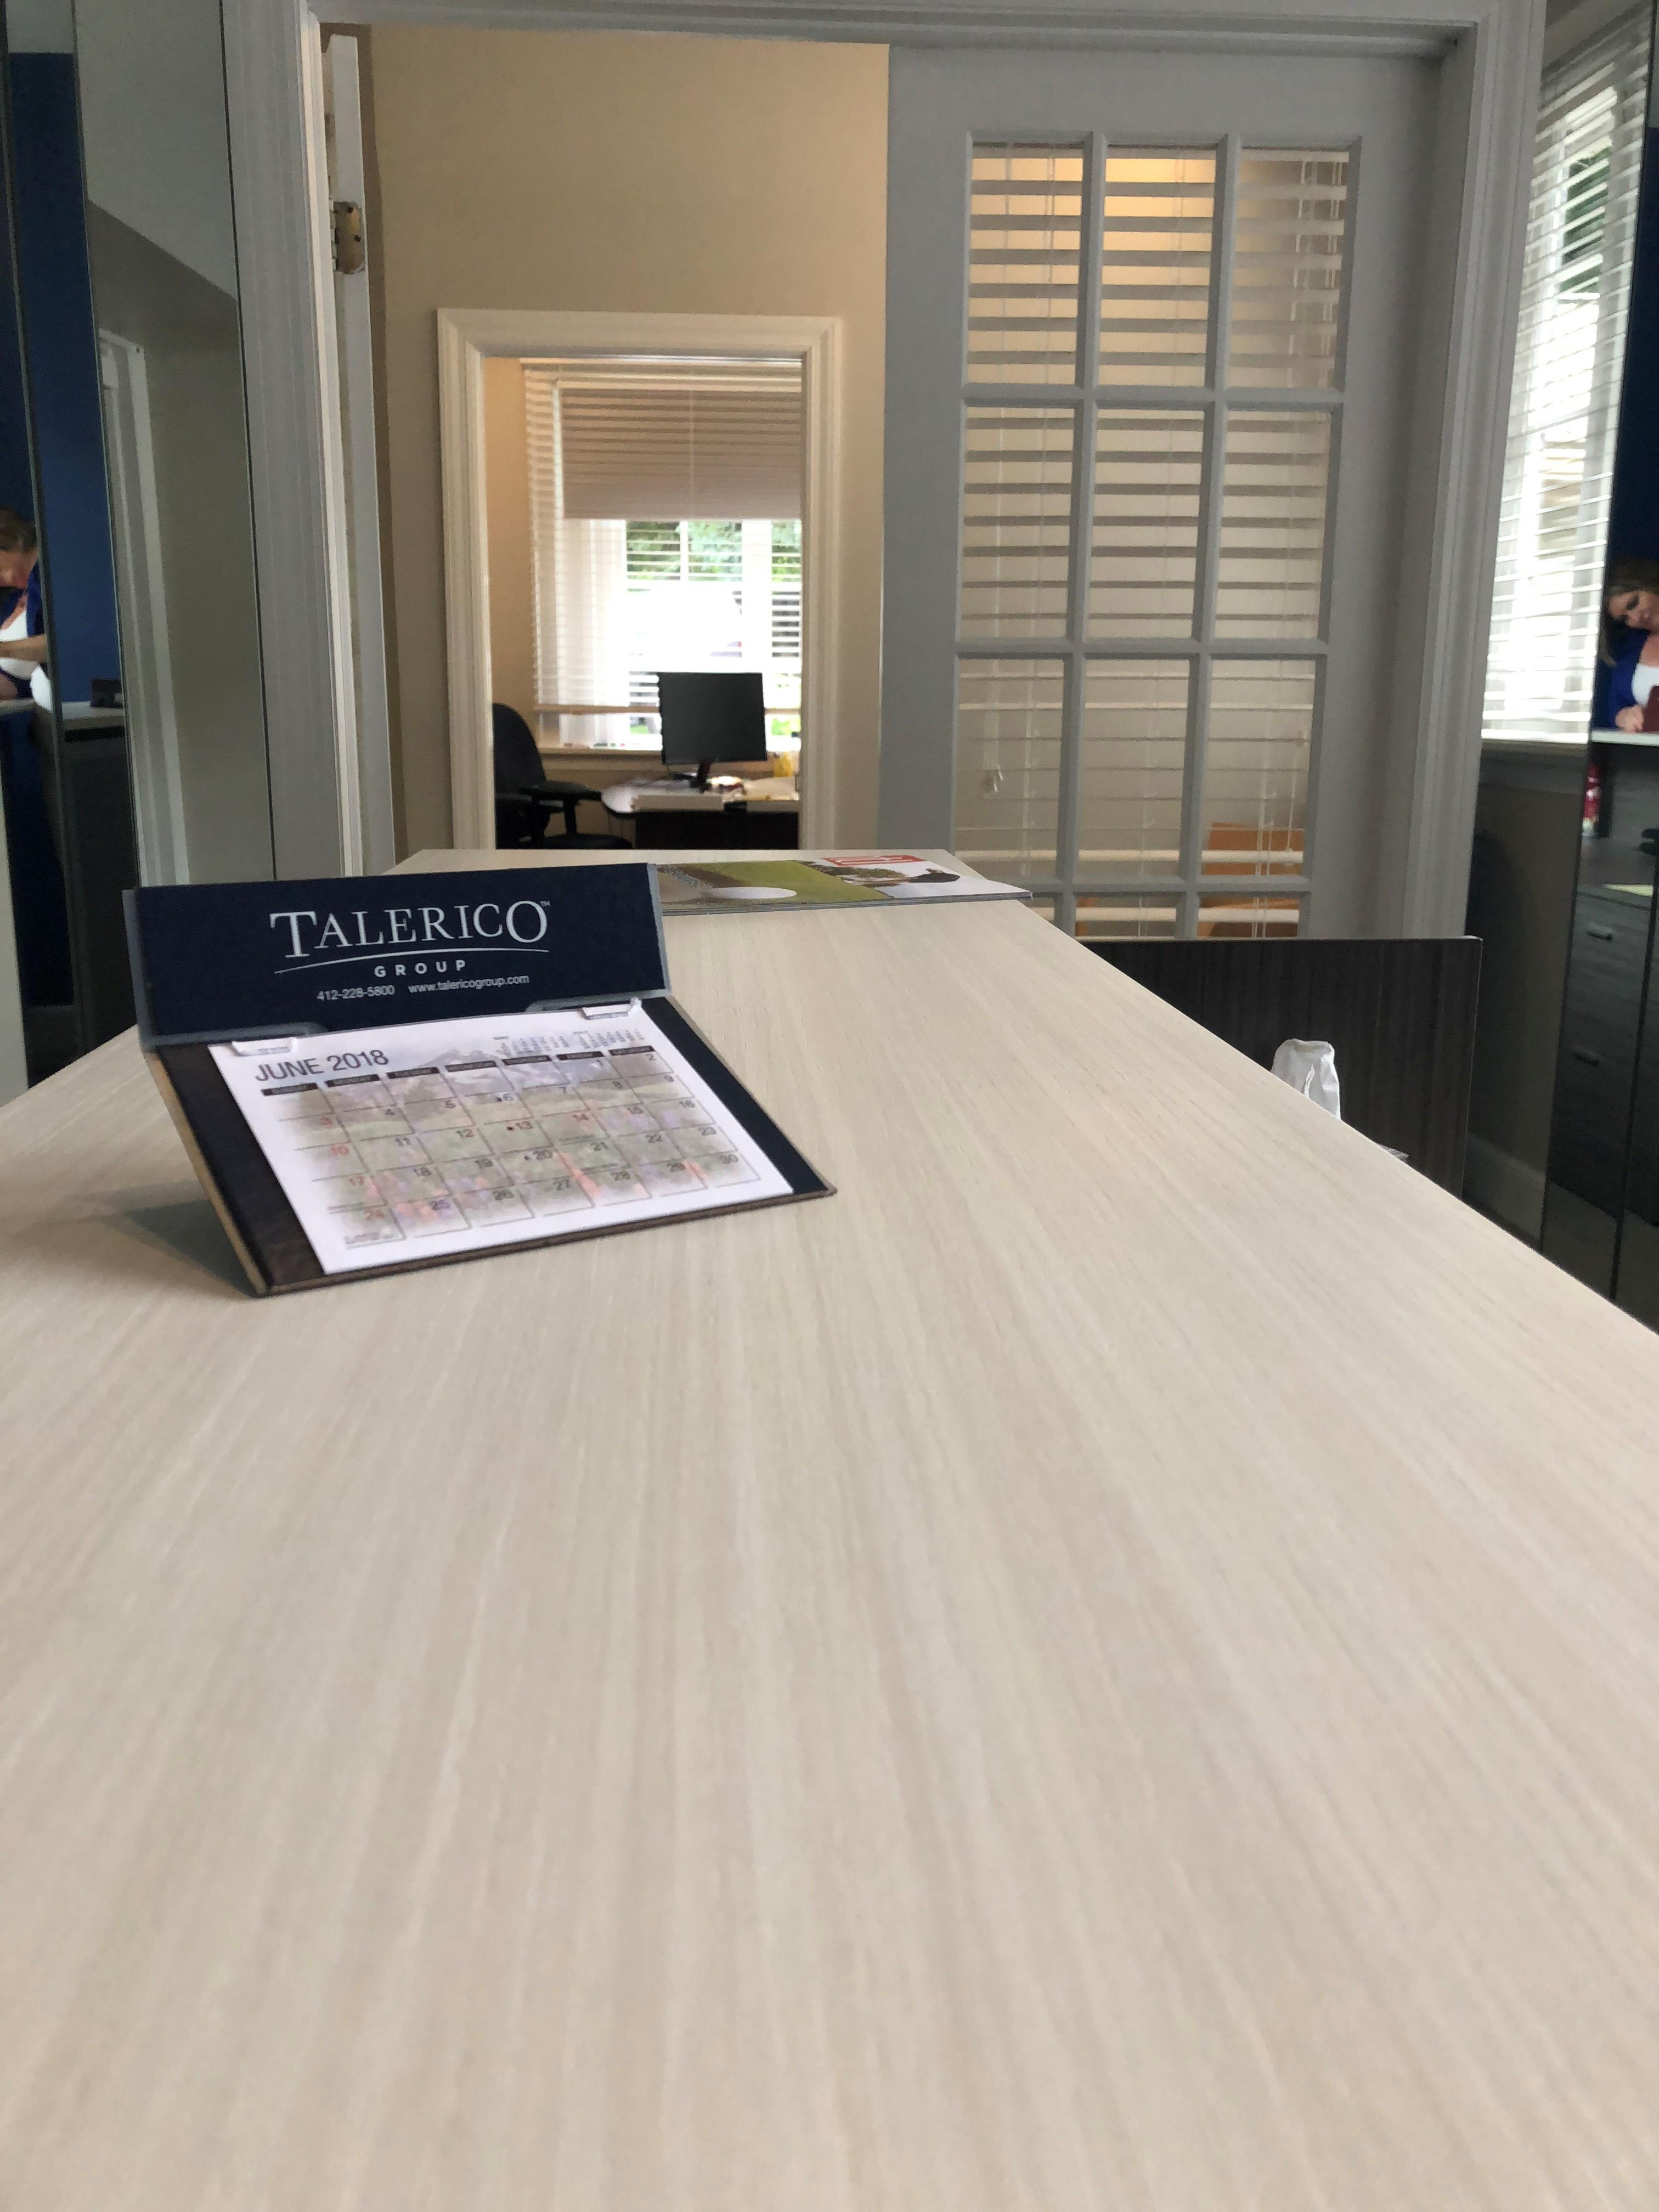 Talerico Group image 2